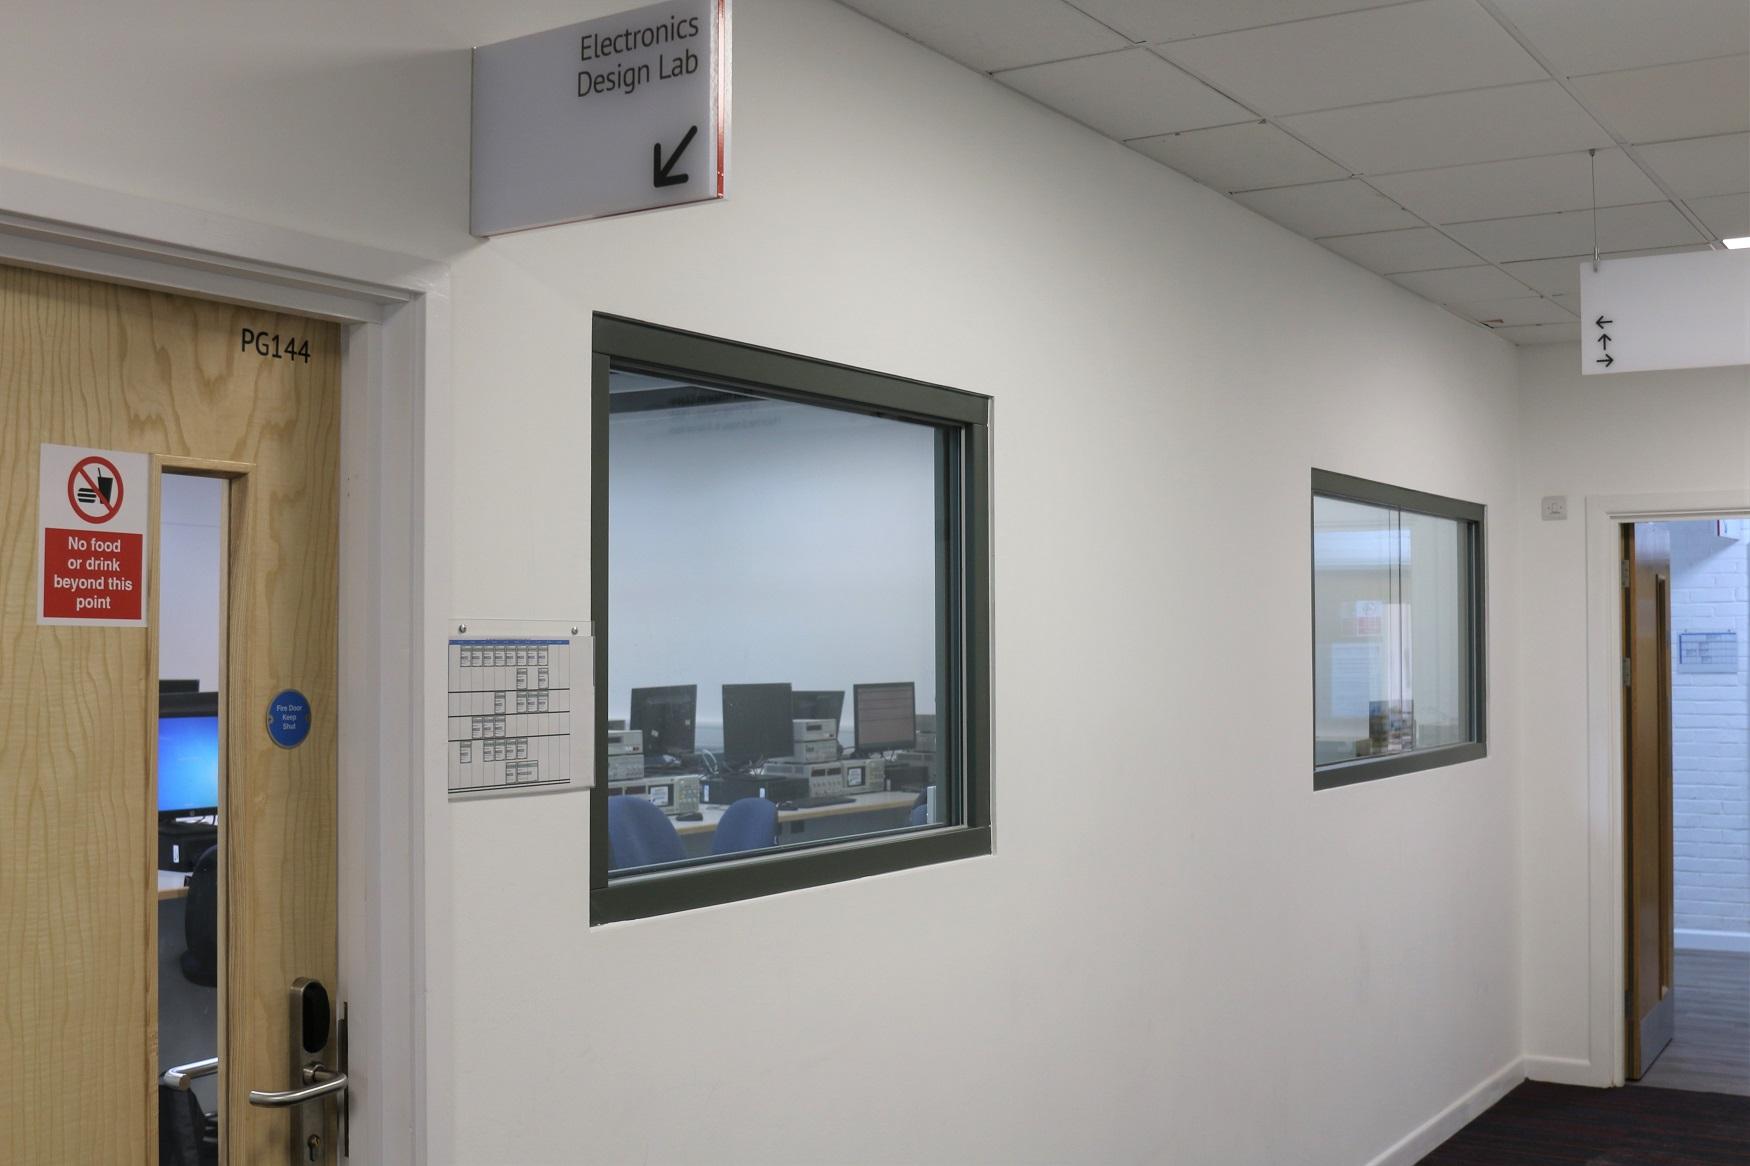 Bournemouth University Electronics Design Lab